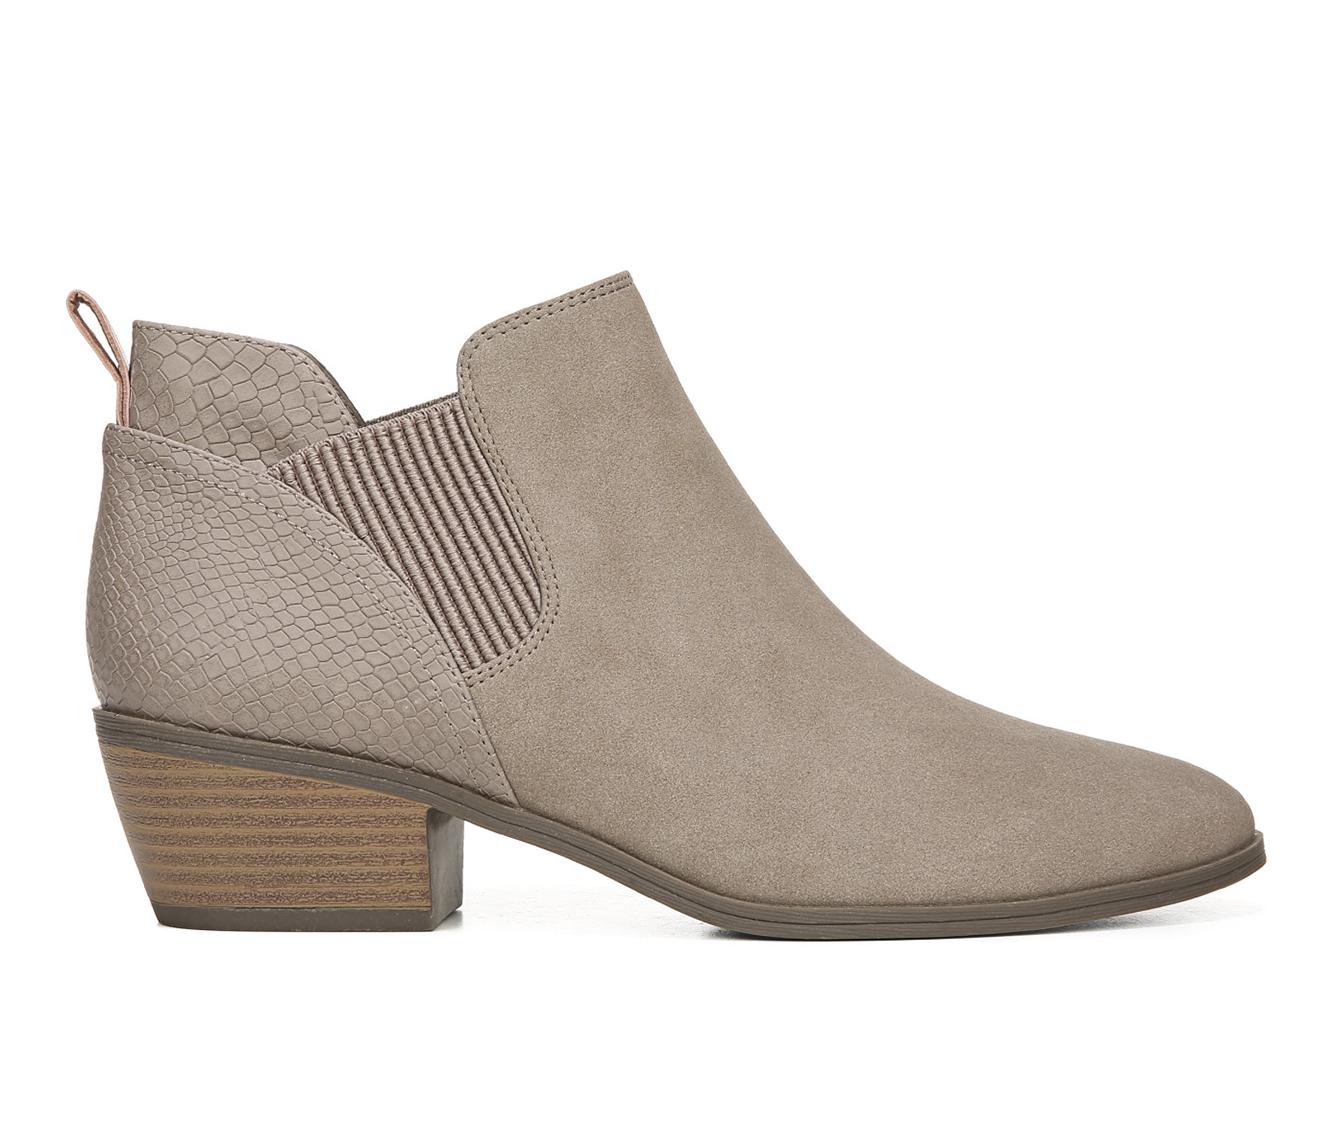 Dr. Scholls Bella Women's Boots (Gray - Faux Leather)